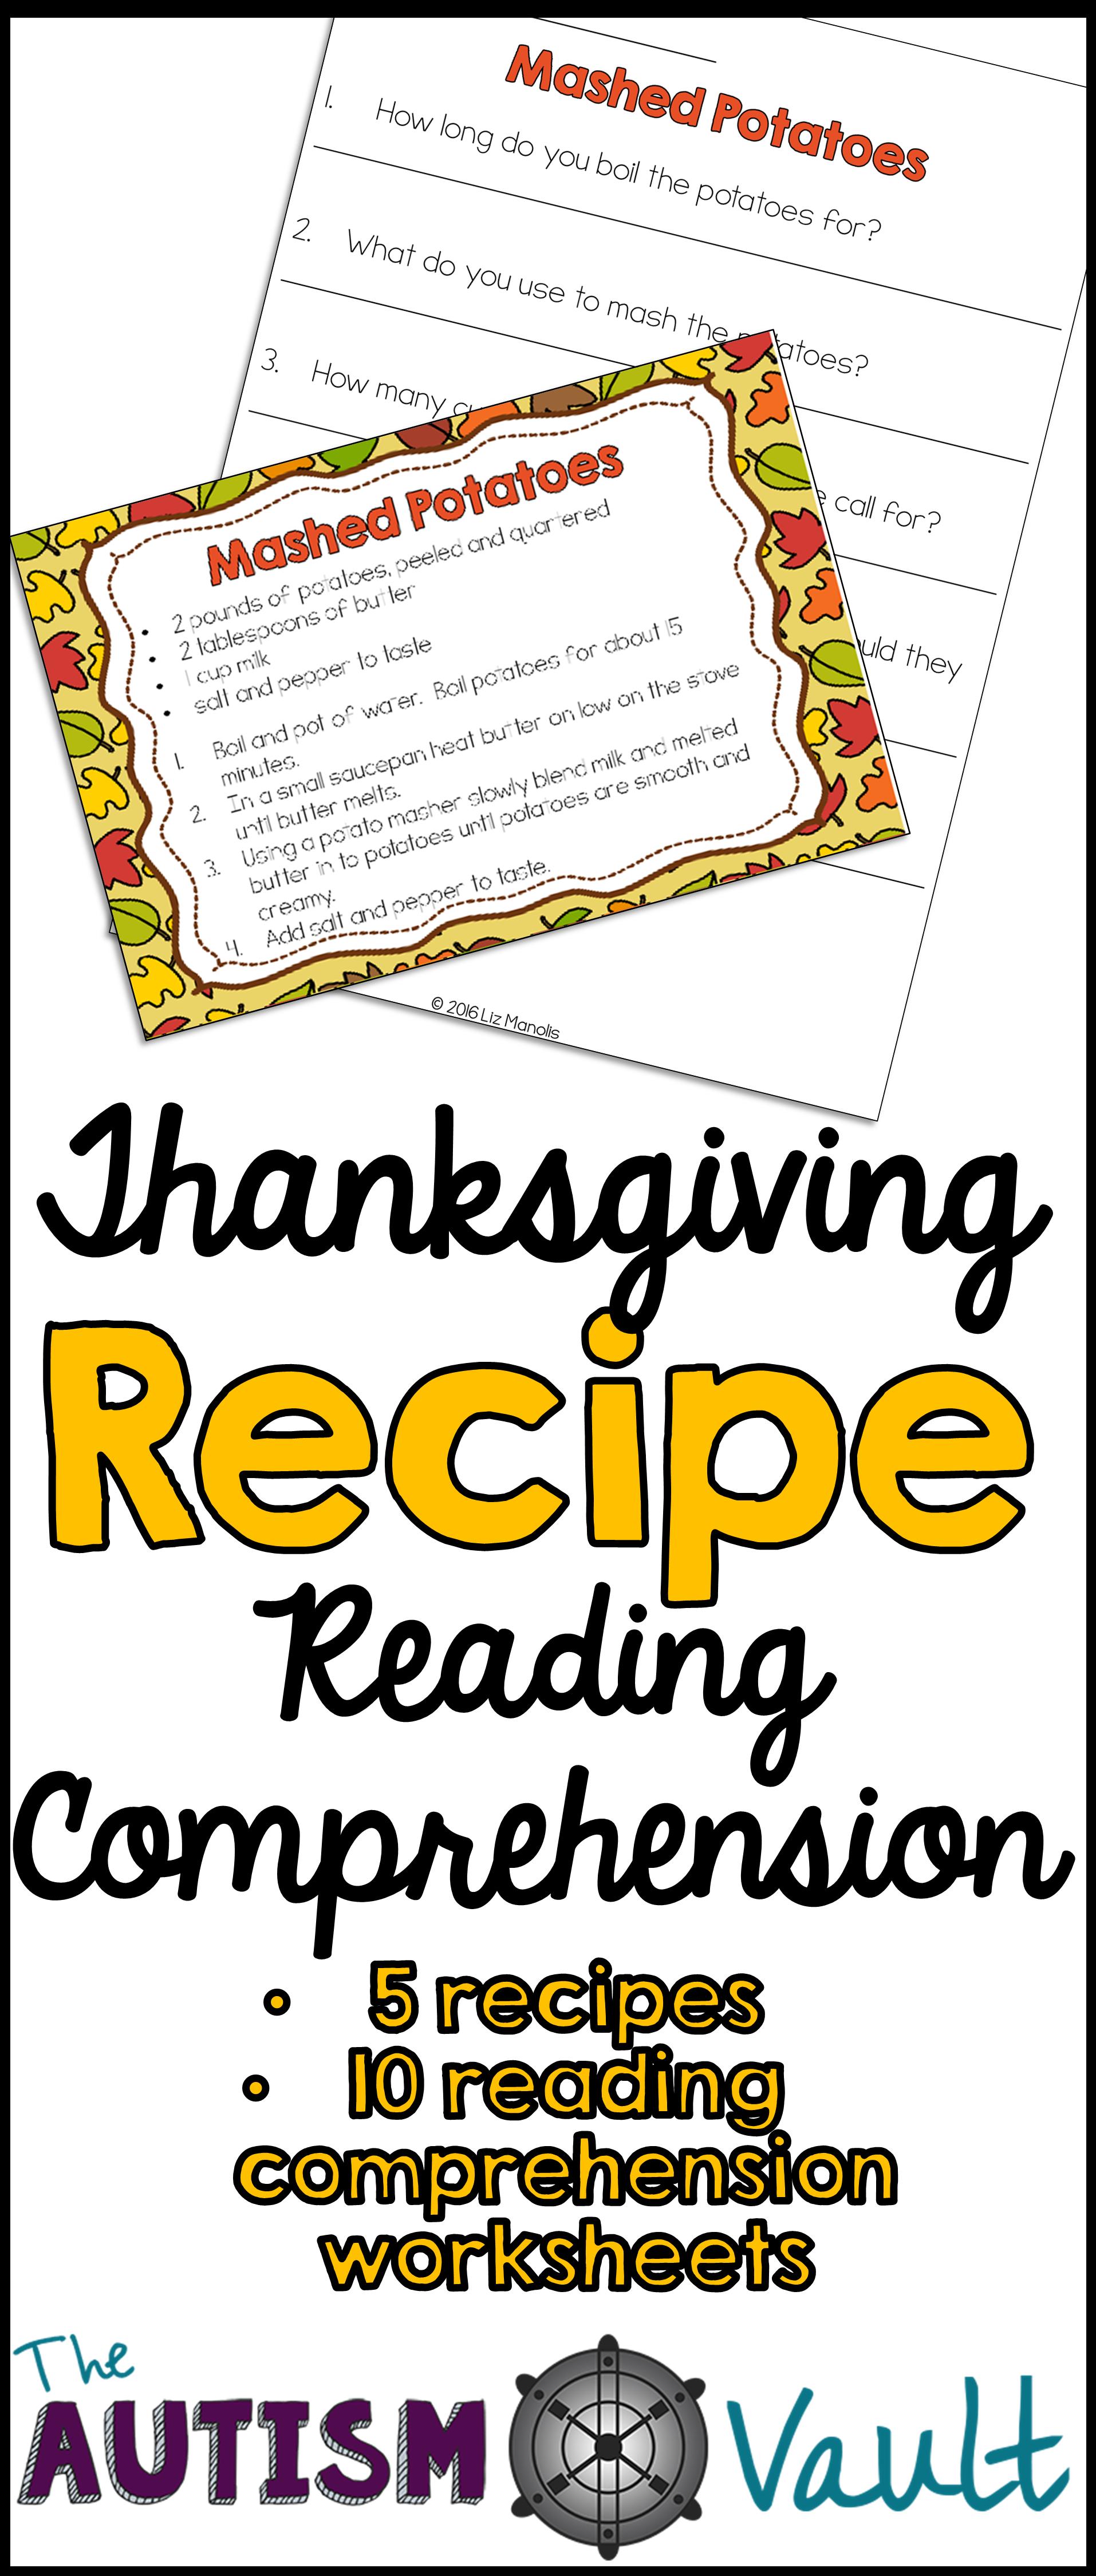 Thanksgiving Recipe Reading Comprehension